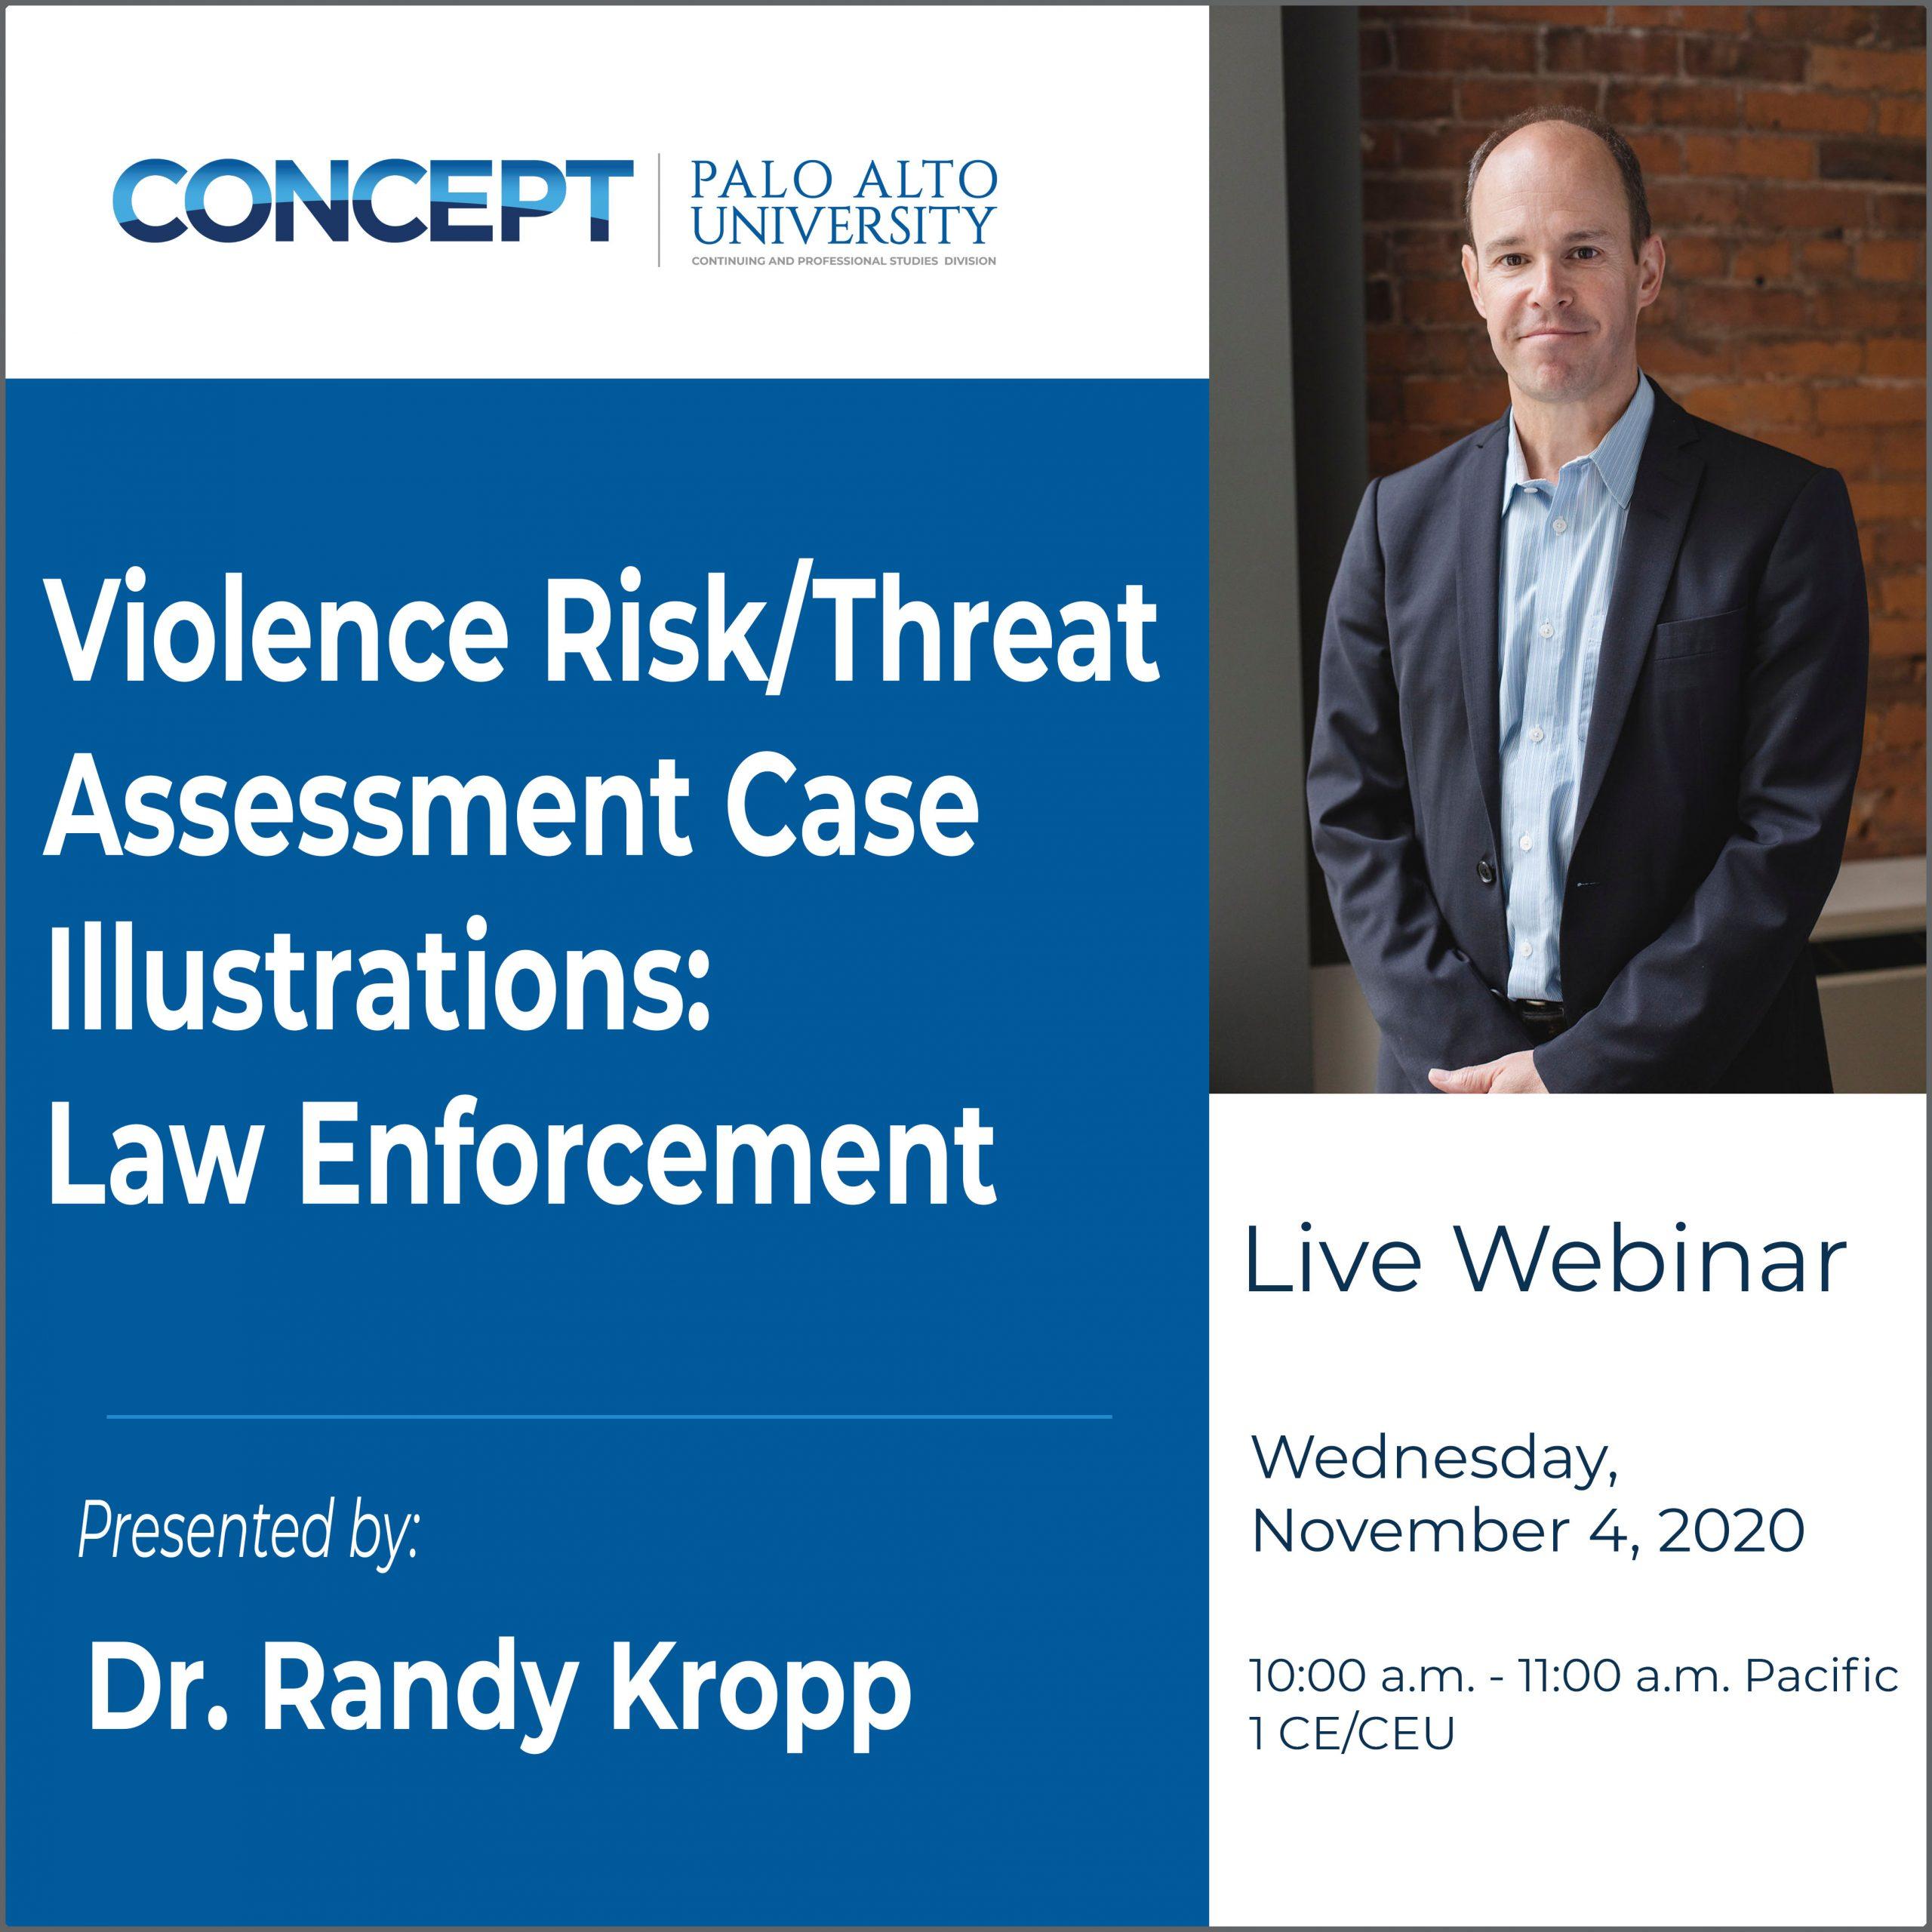 CONCEPT Violence Risk Threat Assessment Law Enforcement Randy Kropp Nov 4 2020